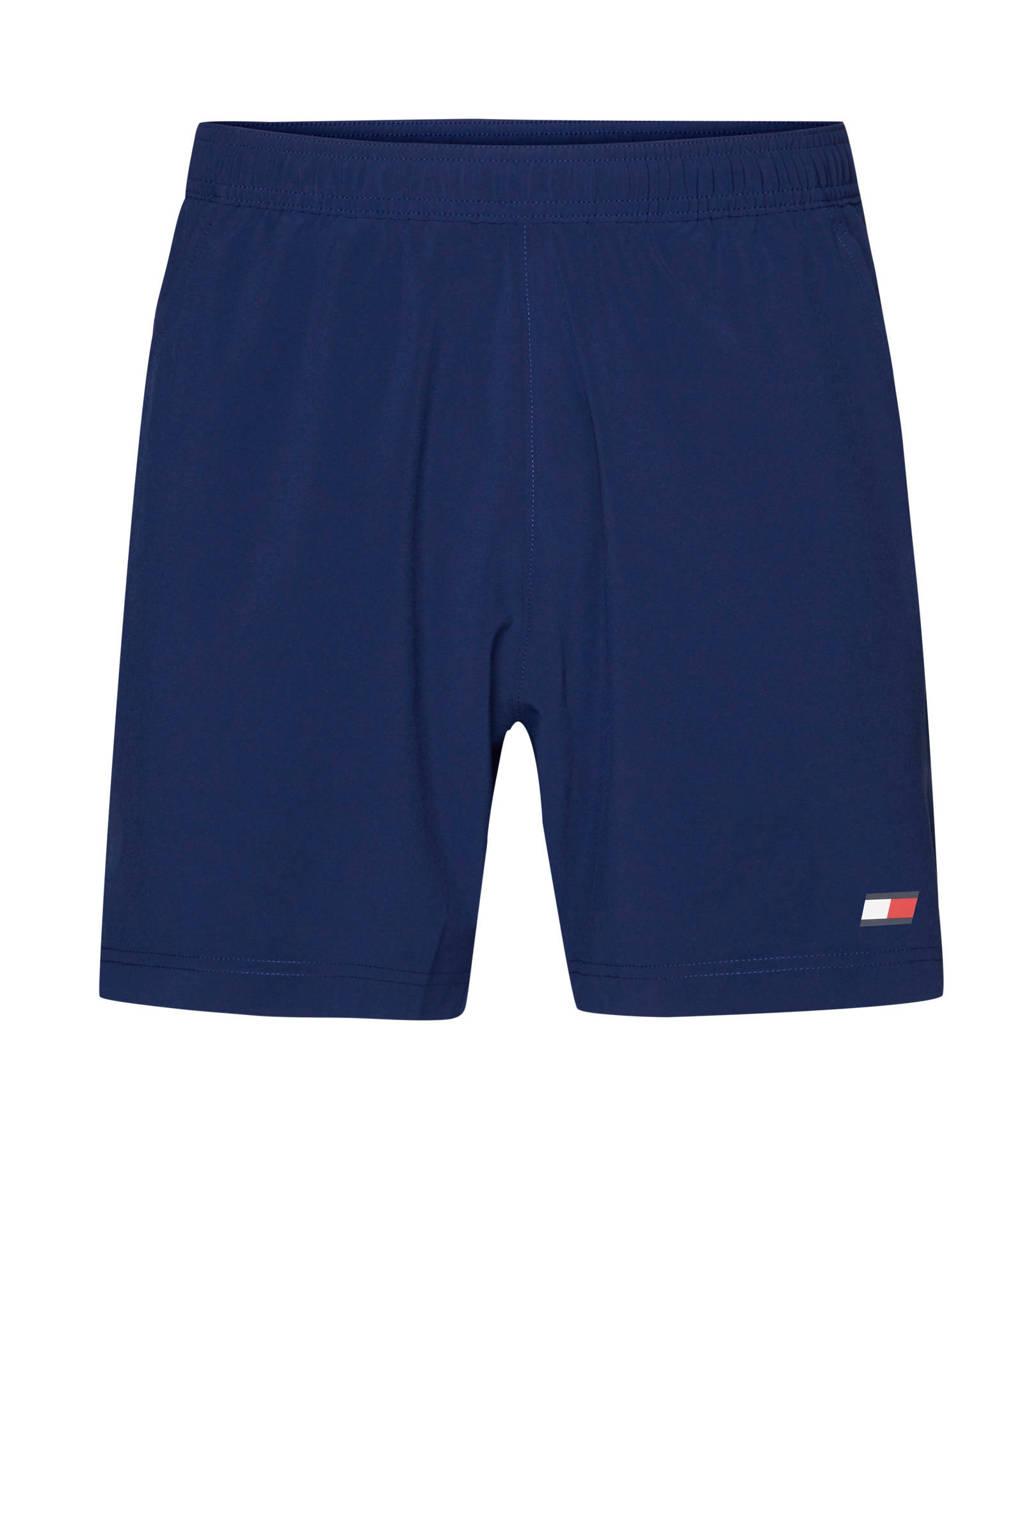 Tommy Hilfiger Sport   short donkerblauw, Donkerblauw